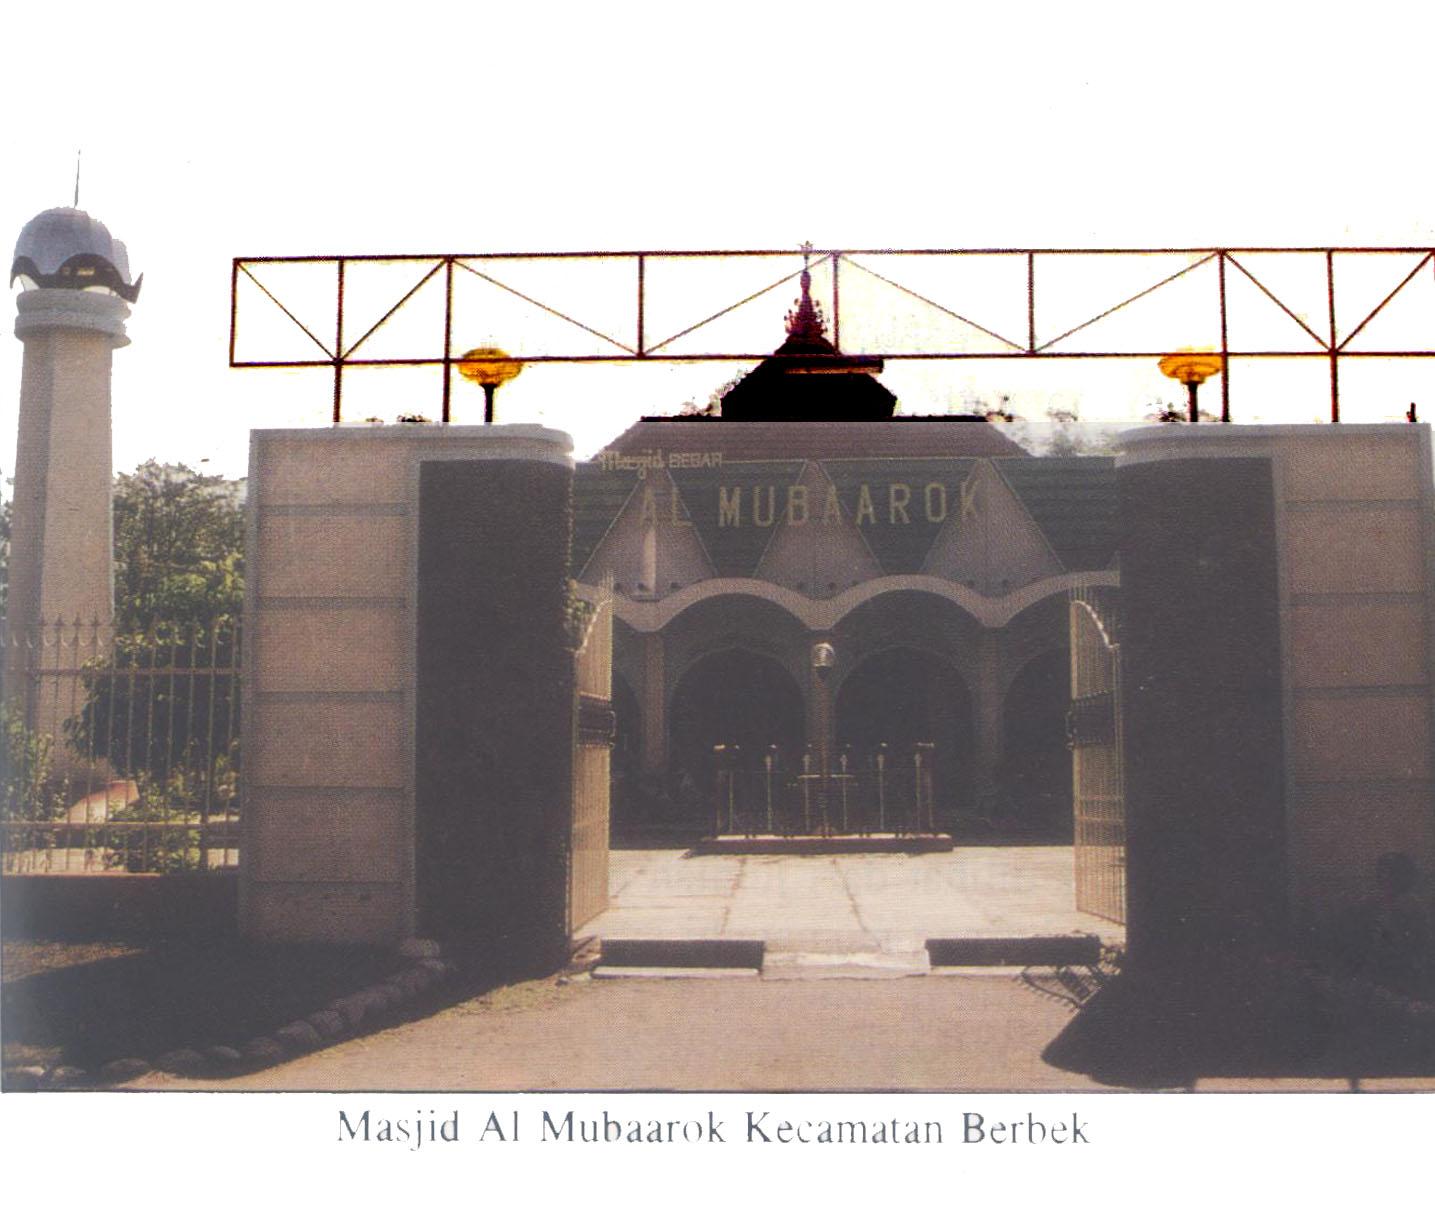 Masjid Al Mubaarok Kabupaten Nganjuk Pusaka Jawatimuran Kebun Teh Jamus